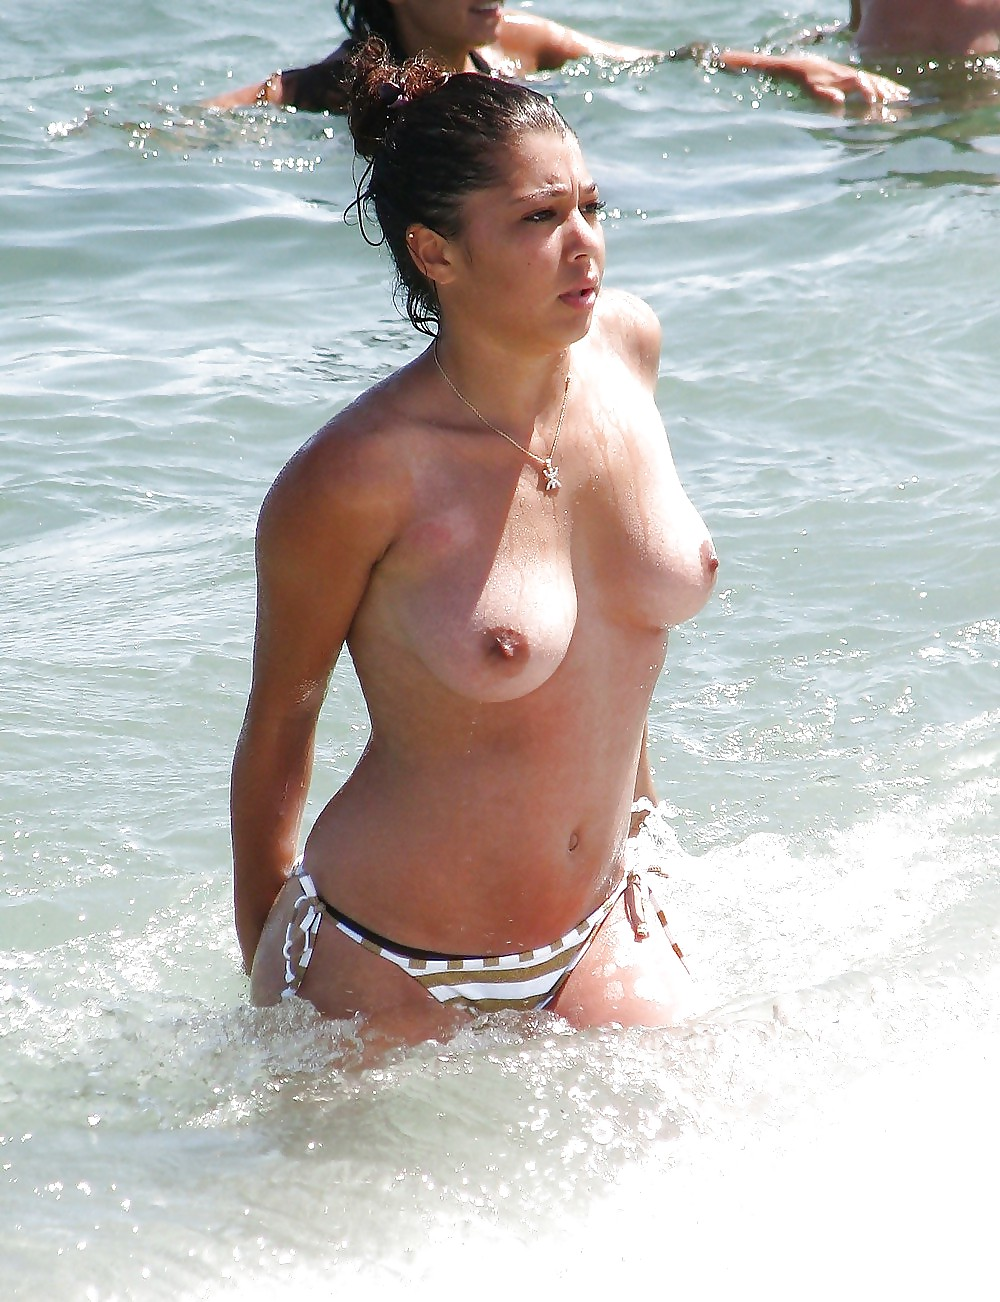 Best tits nude beach-7727